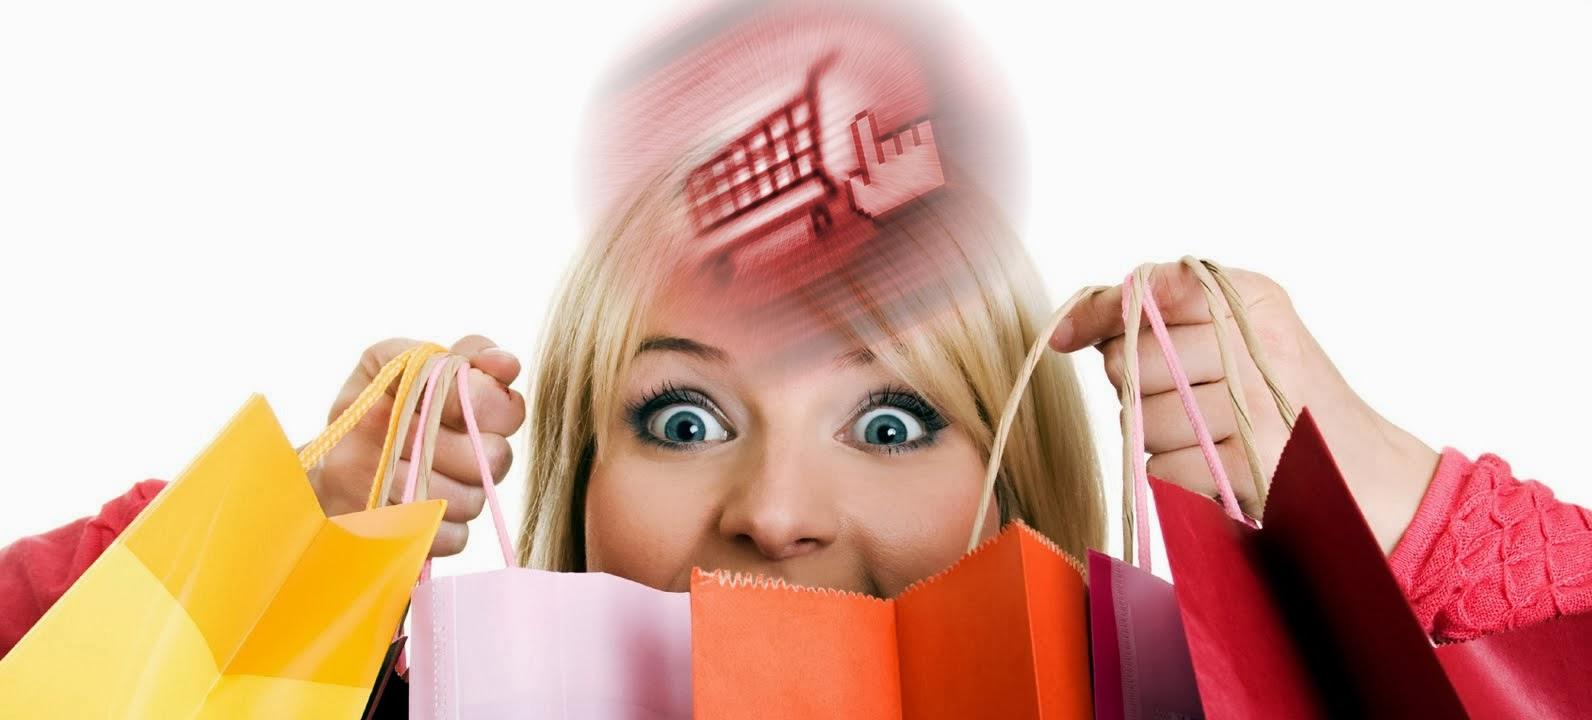 compras-internacionais-abaixo-de-100-dolares-nao-podem-ser-tributadas-taxadas-50-reembolso-alfandegario